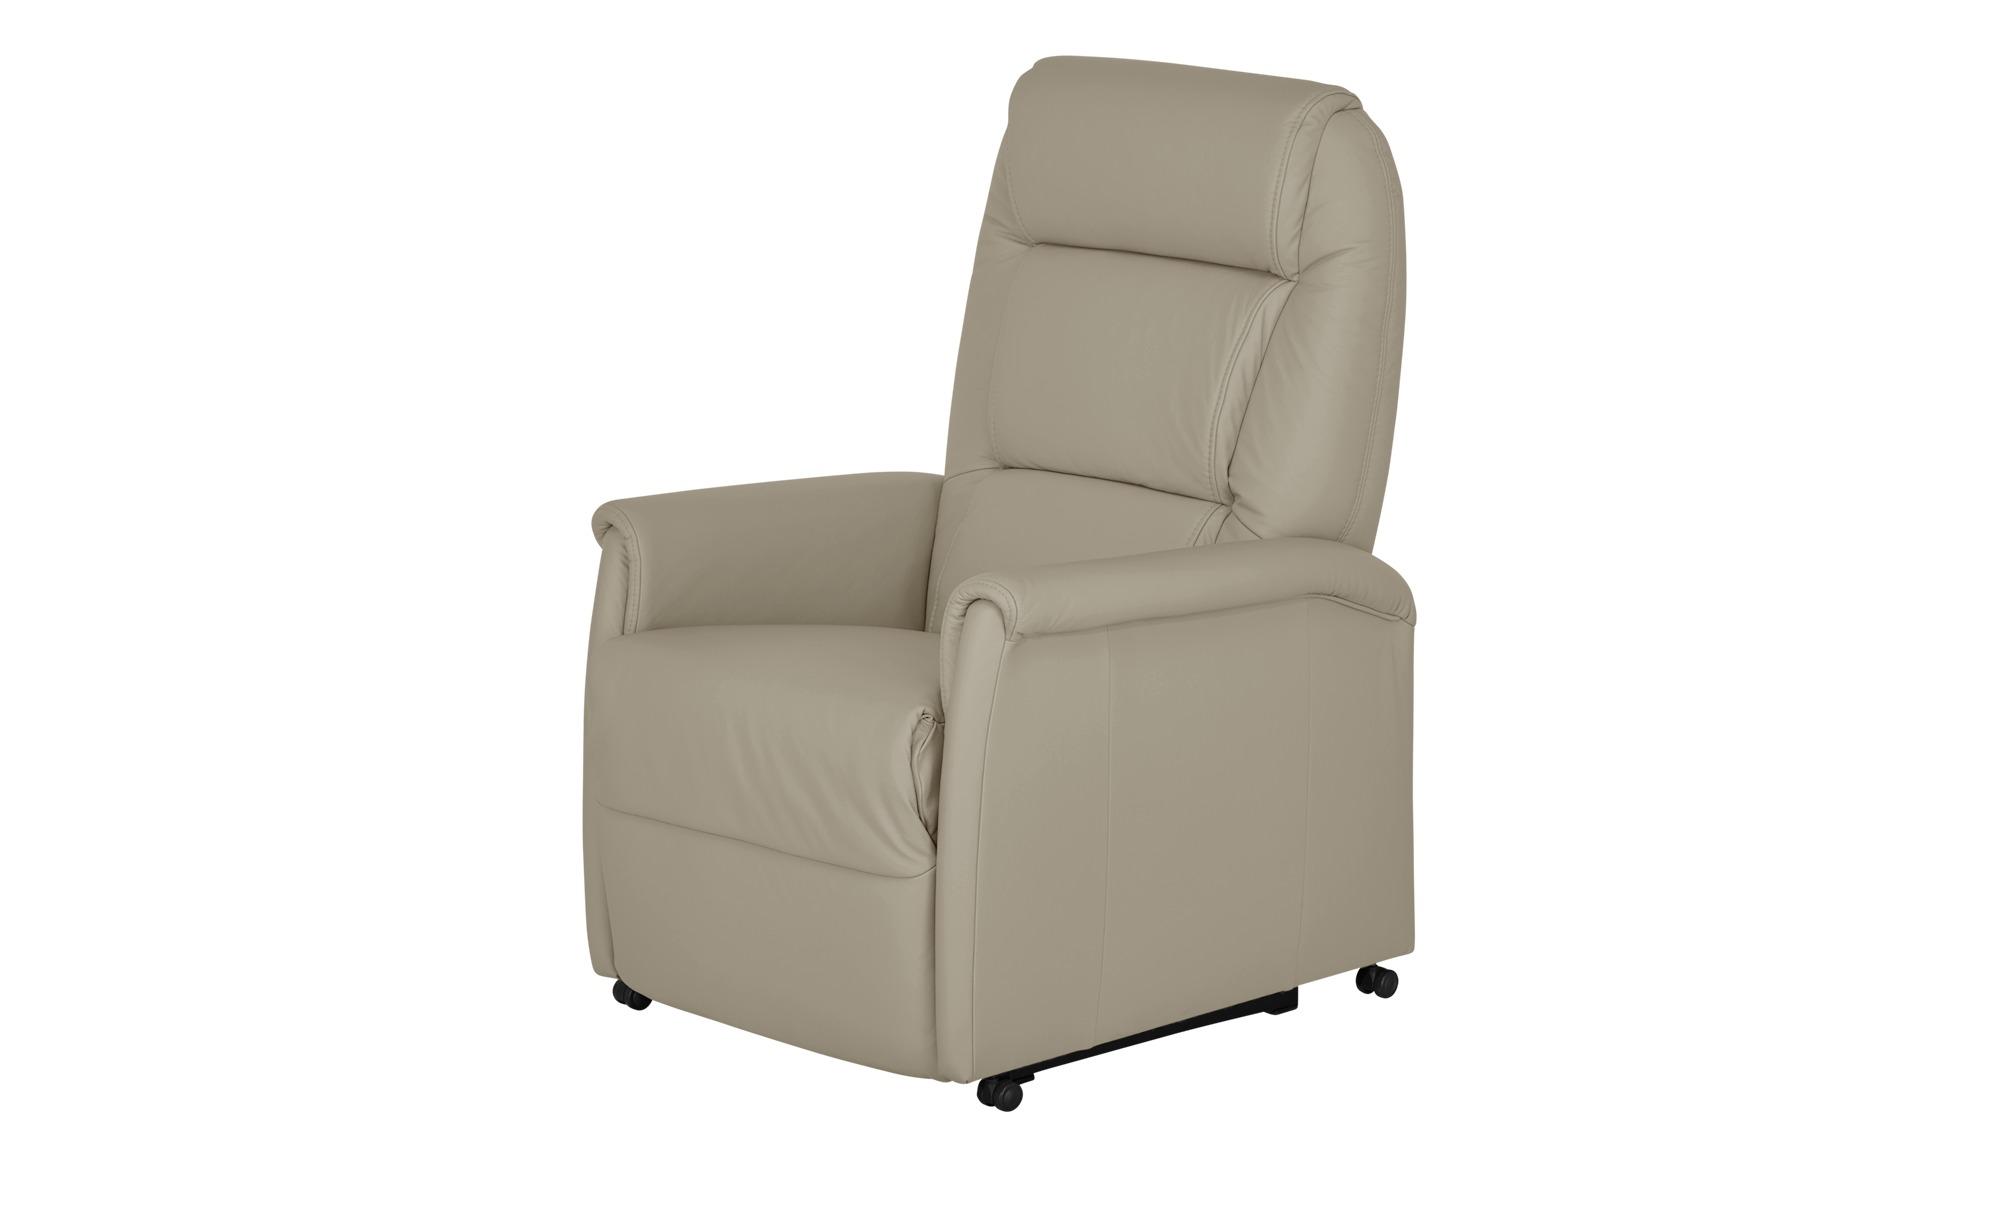 himolla Fernsehsessel grau - Leder 9773 ¦ grau ¦ Maße (cm): B: 74 H: 110 T: 85 Polstermöbel > Sessel > Fernsehsessel - Höffner | Wohnzimmer > Sessel > Fernsehsessel | Möbel Höffner DE